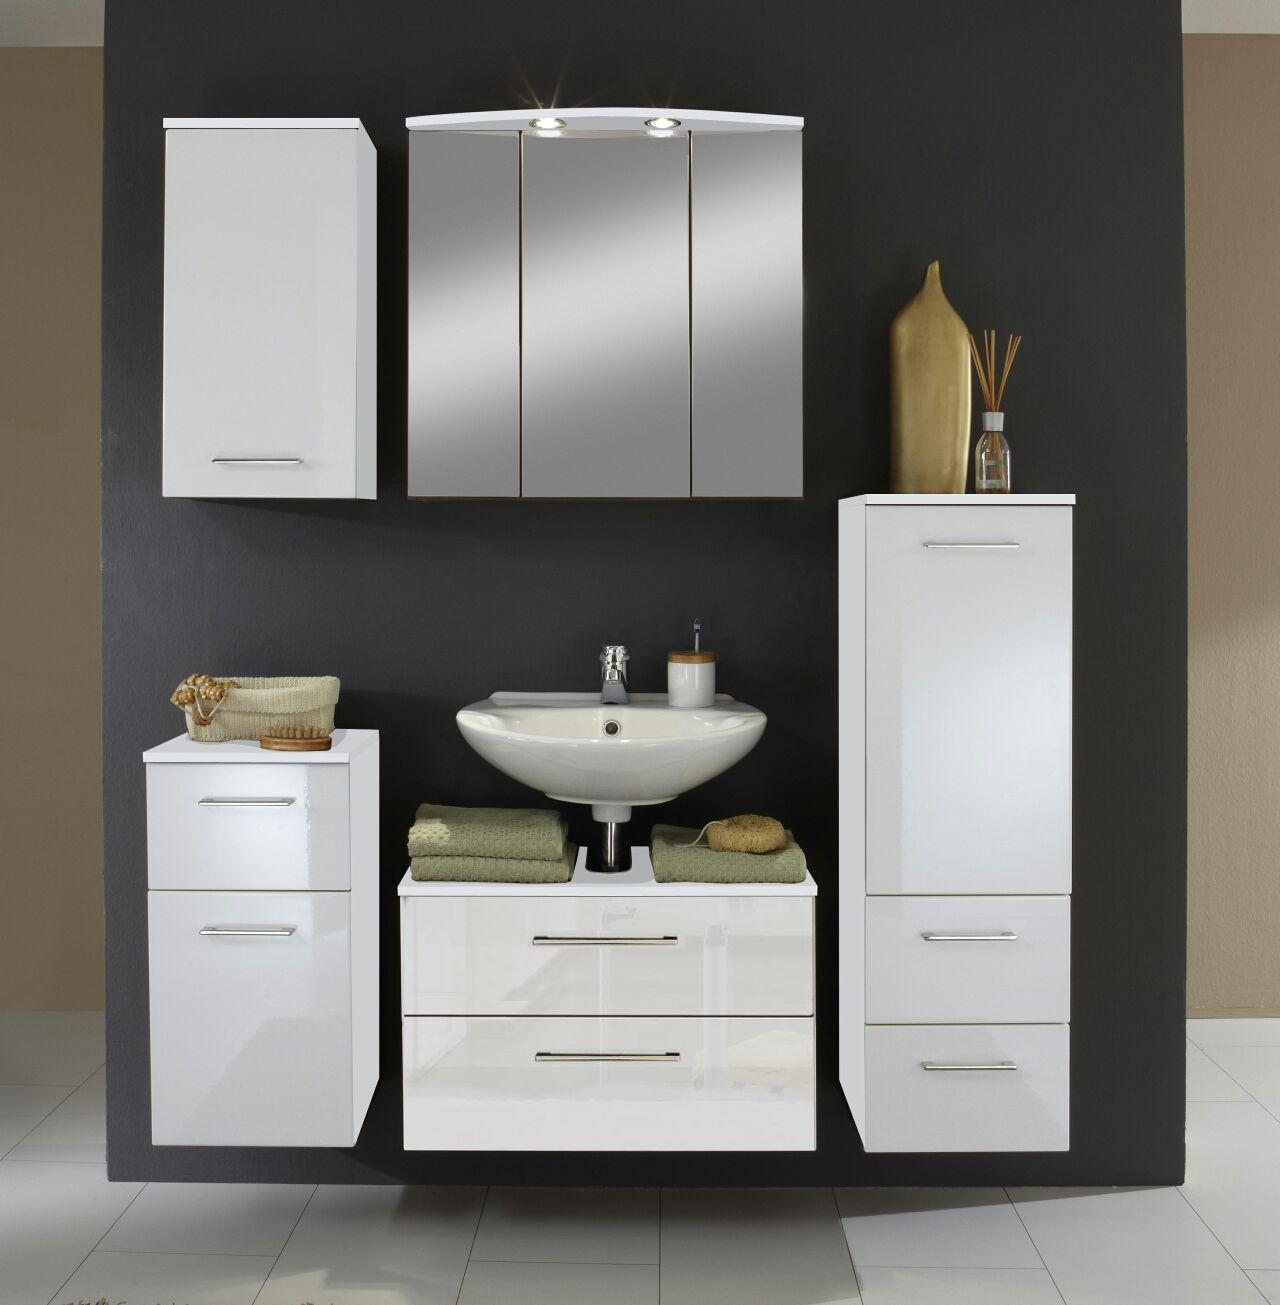 bad h ngeschrank next 1 t rig 35 cm breit hochglanz wei bad next. Black Bedroom Furniture Sets. Home Design Ideas